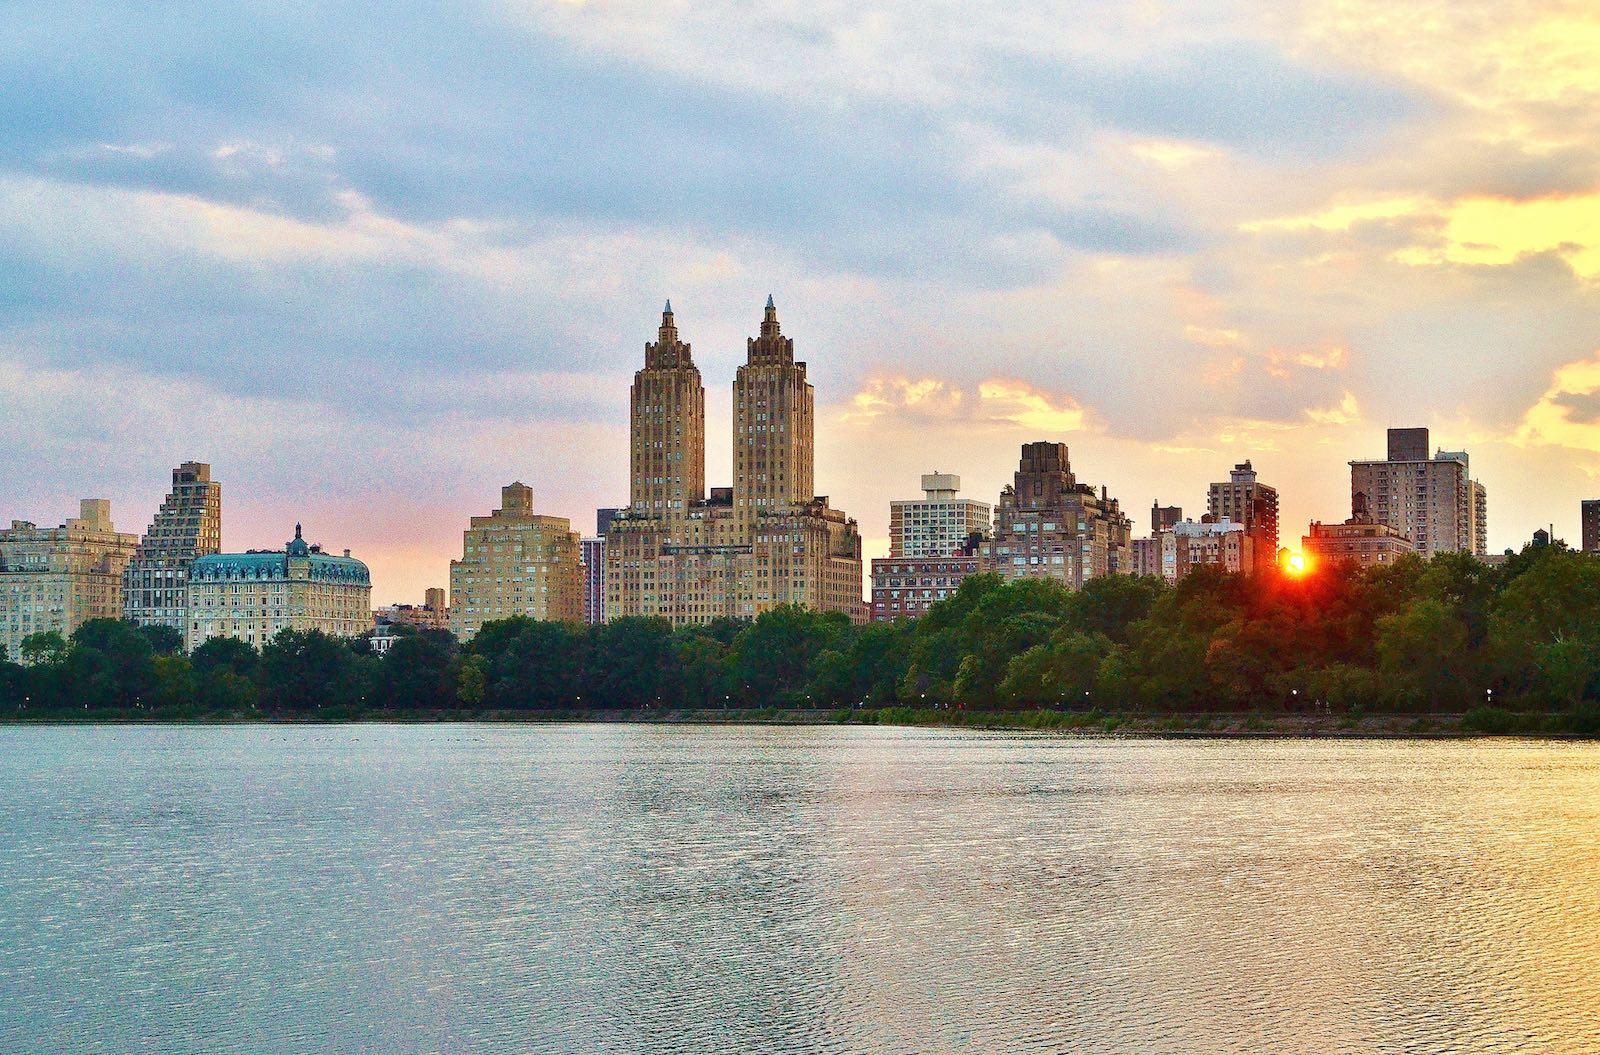 Anochecer en Central Park en verano